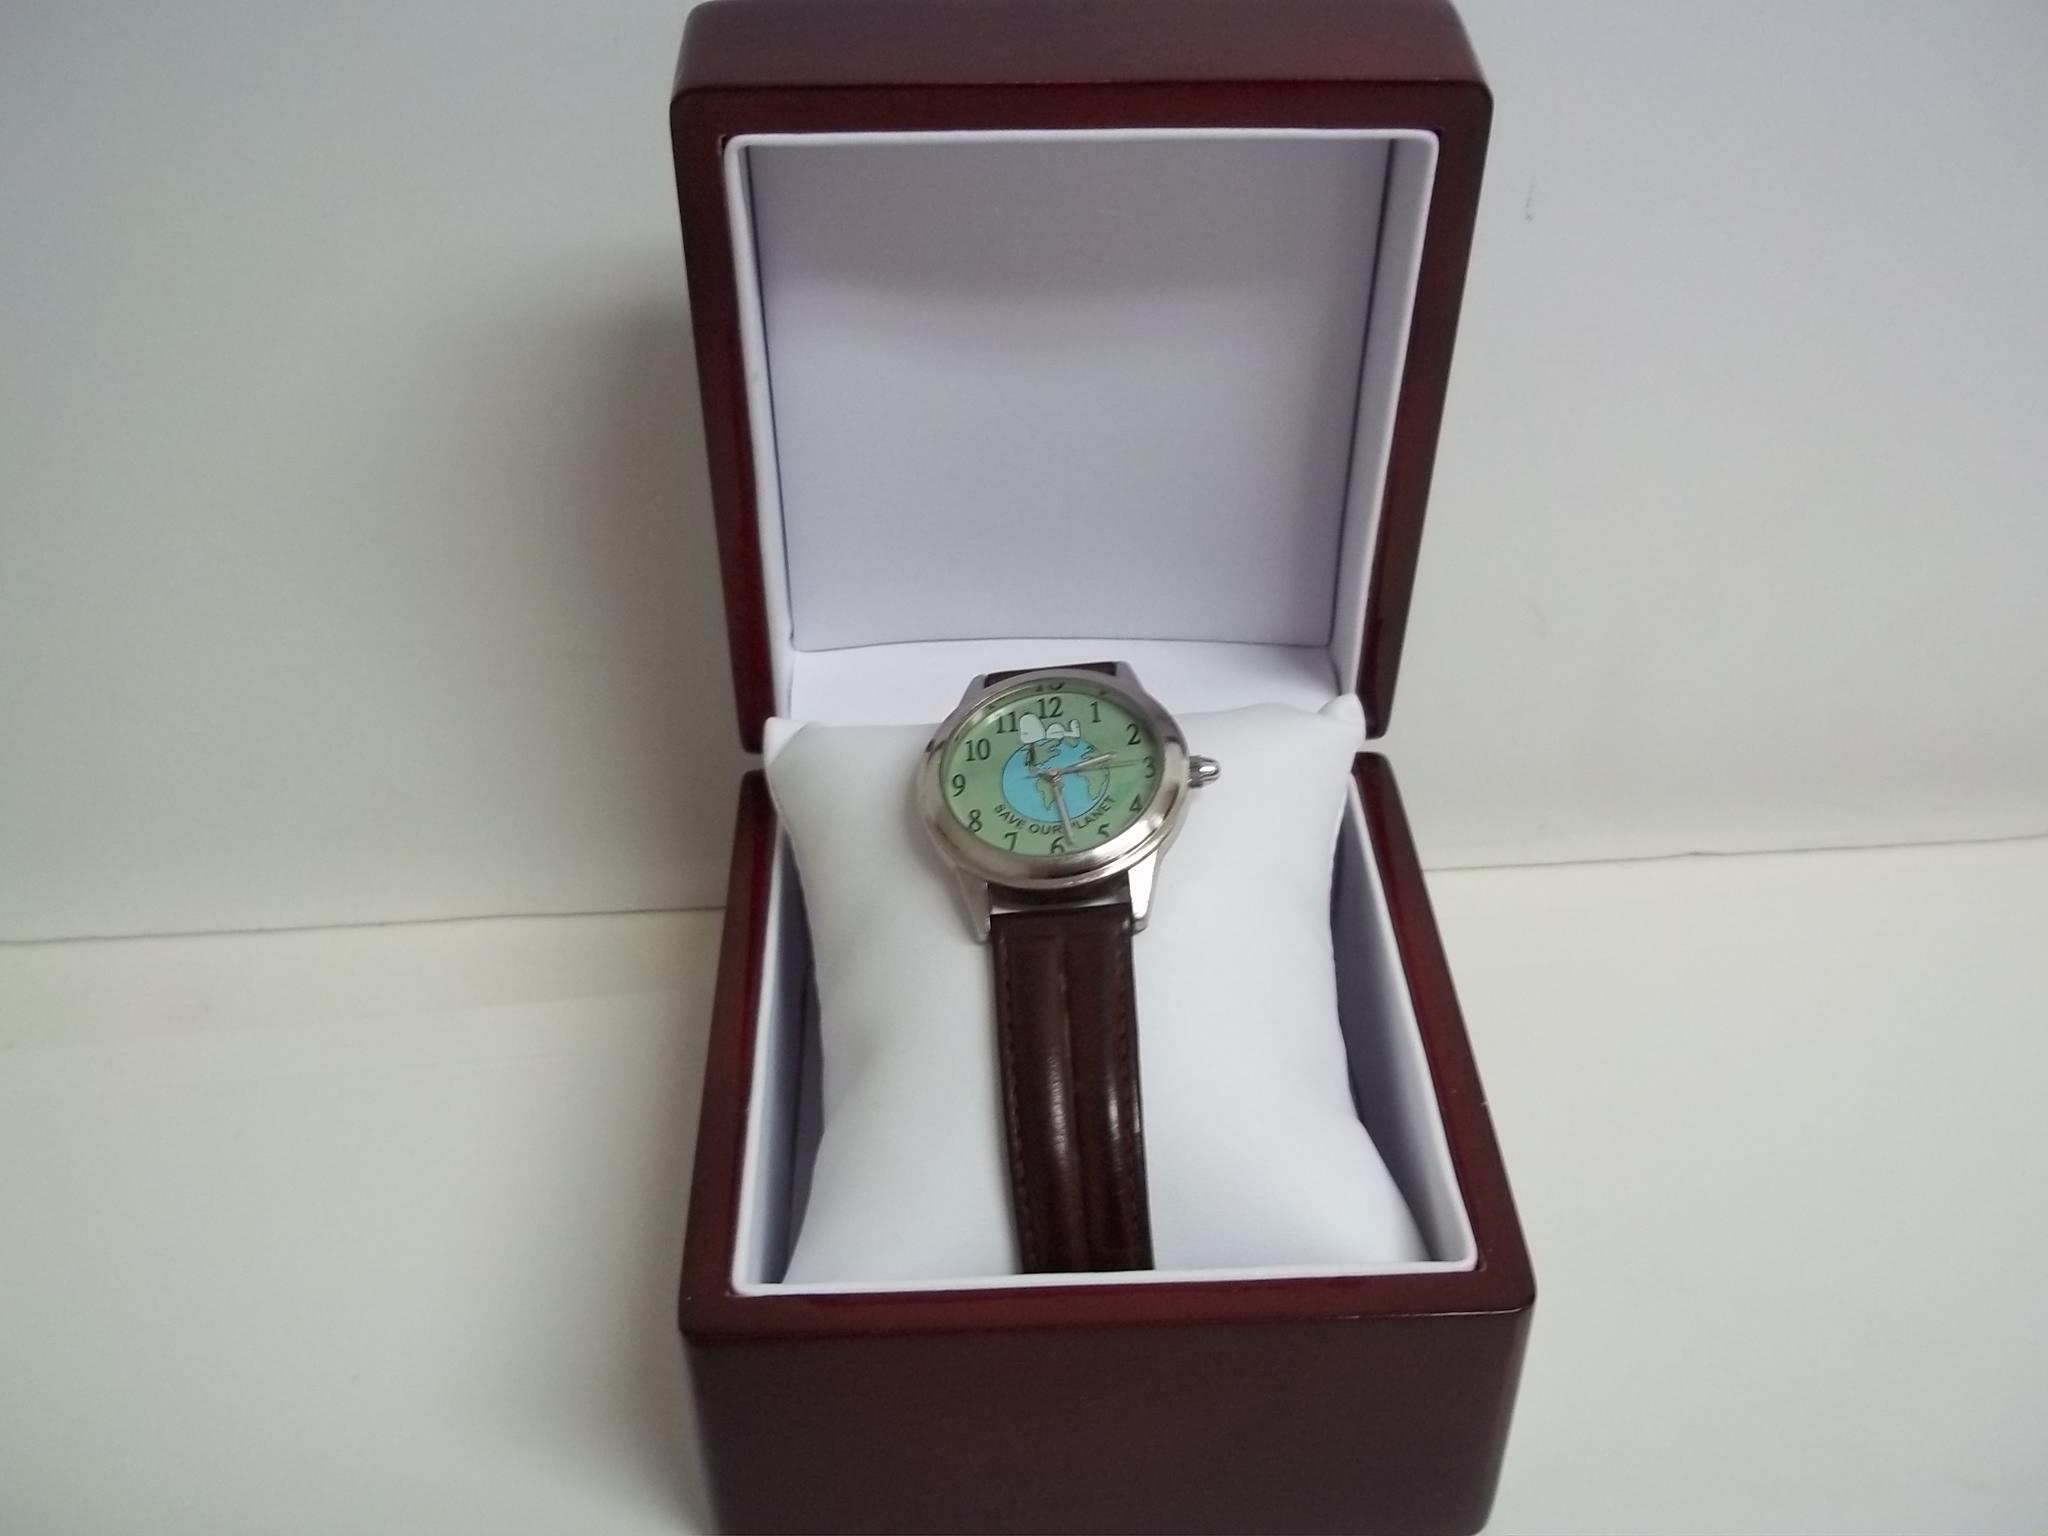 BXWW New! Rosewood Finish Single Watch Display Box